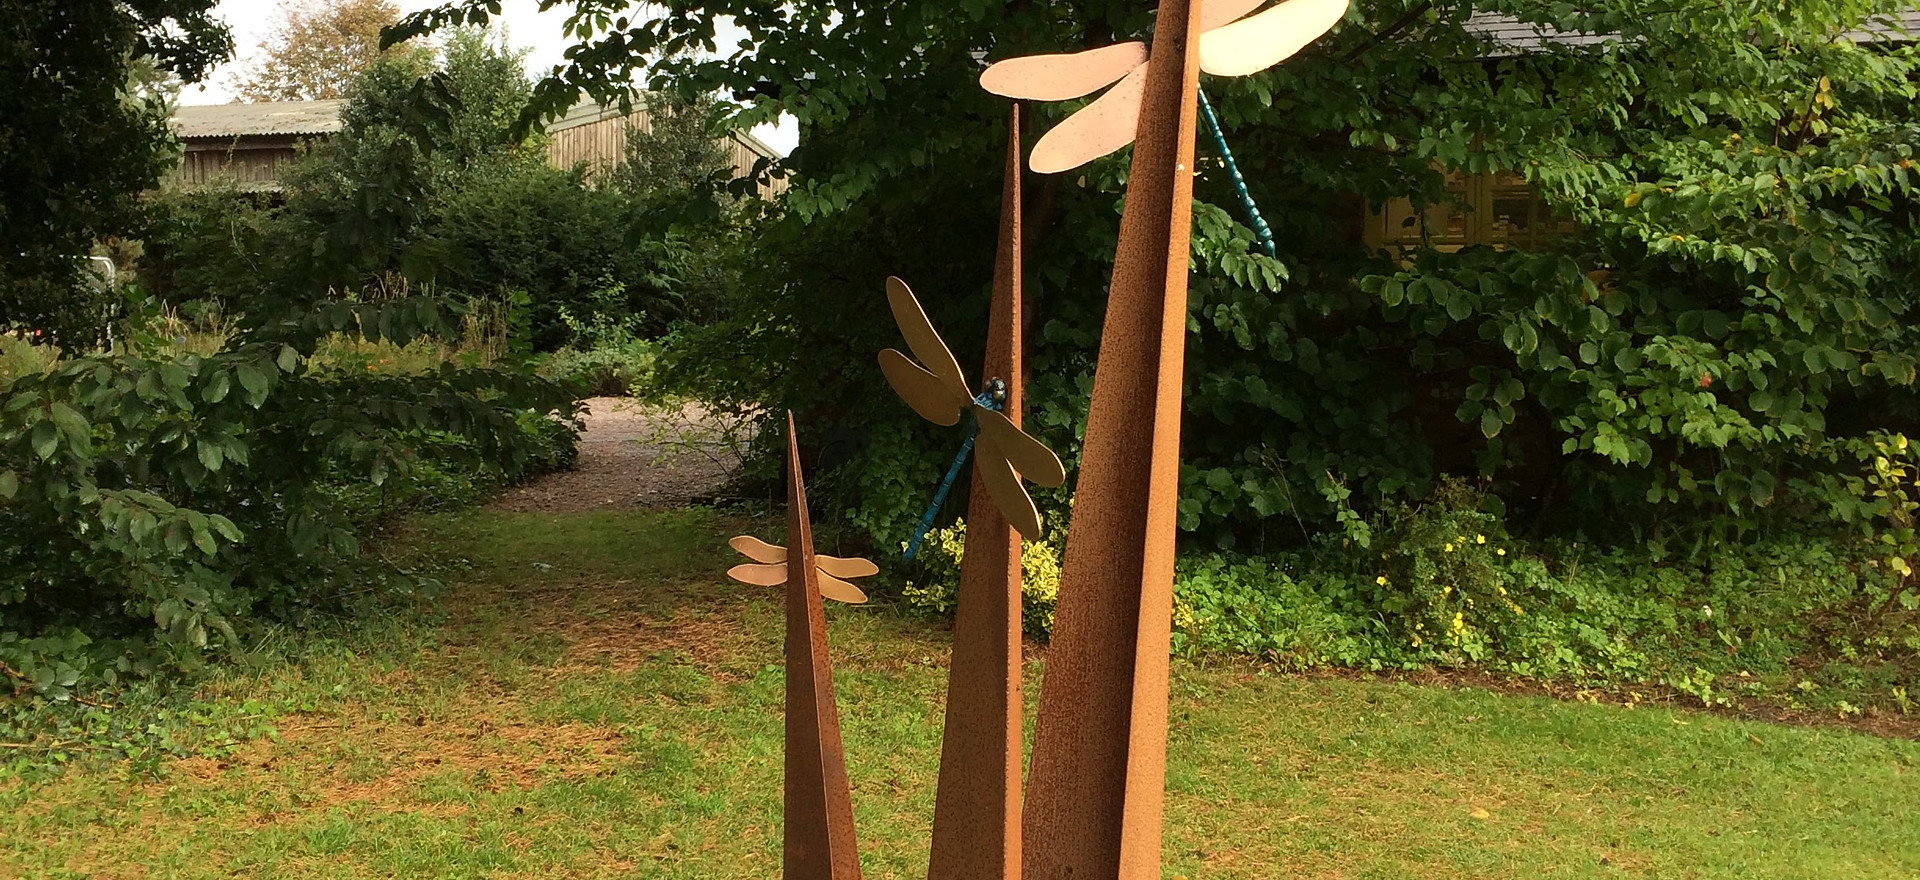 """Dragonflies on Blades"""